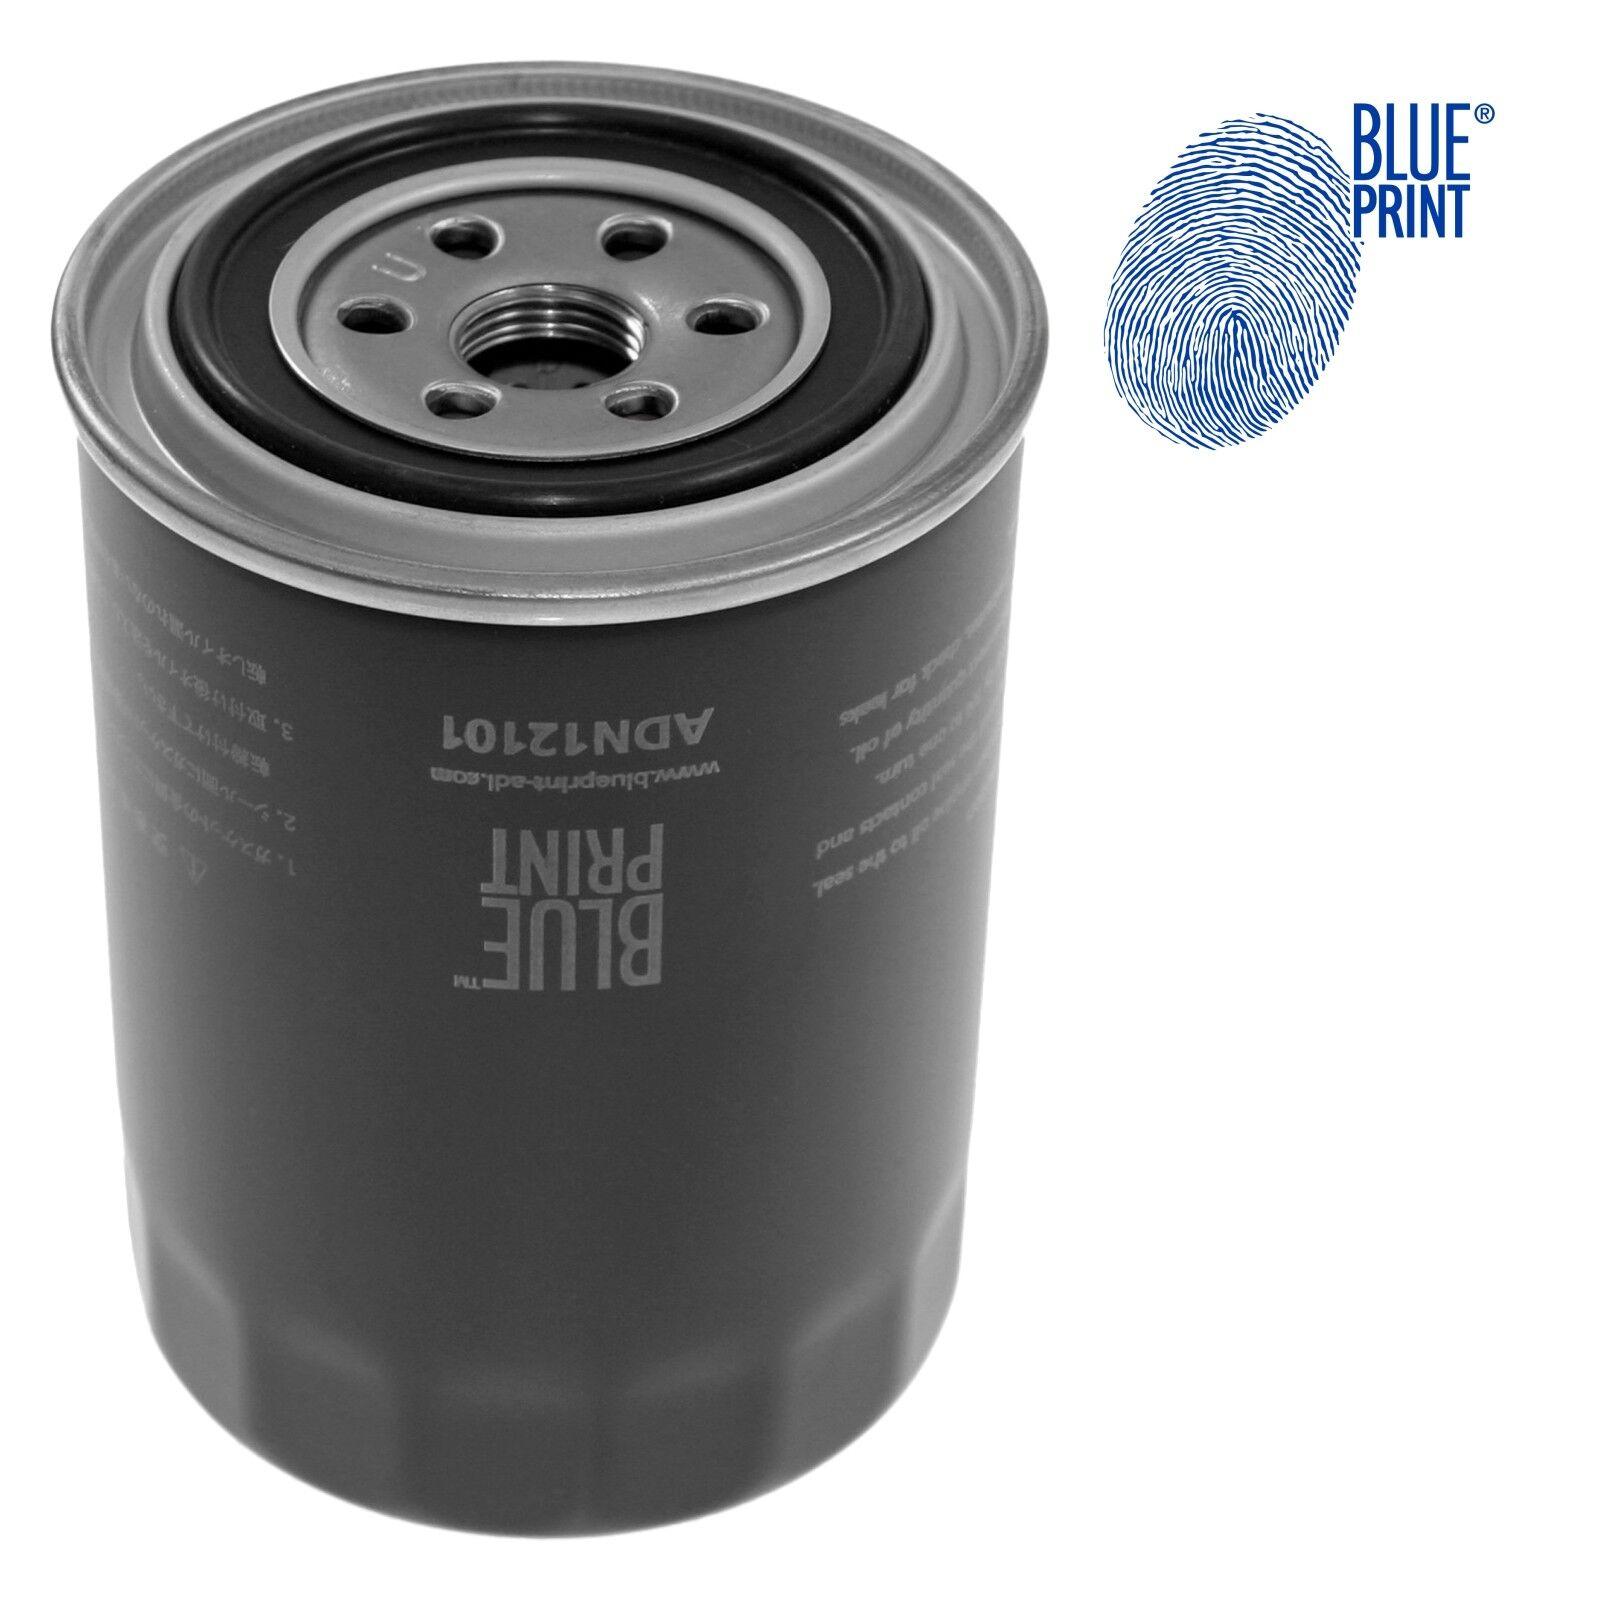 Blue Print Ölfilter Motoröl ADN12101 | eBay